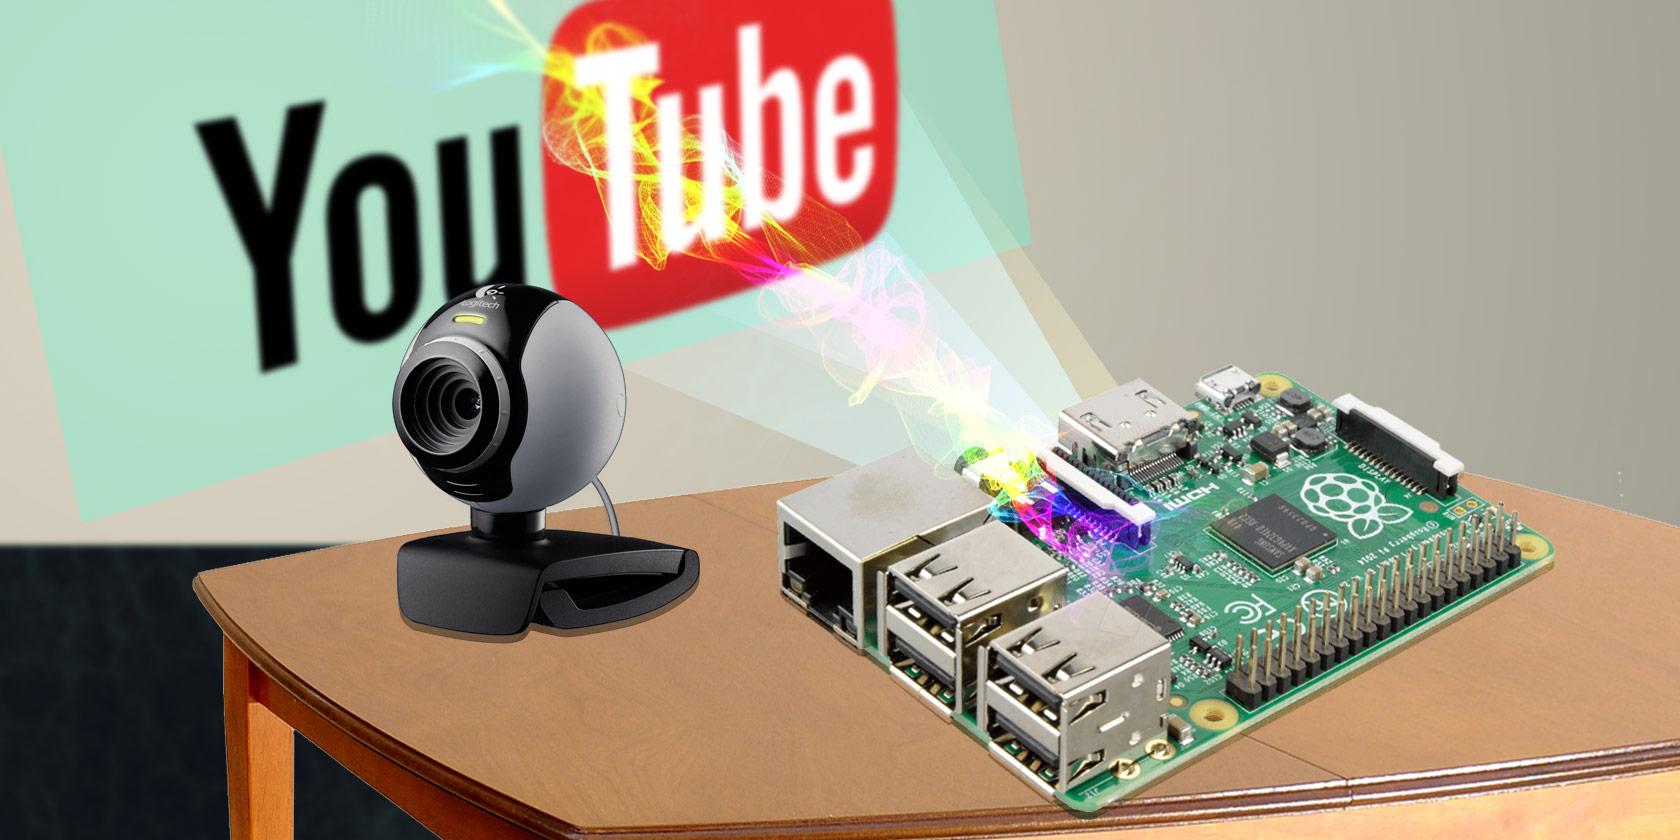 stream-youtube-raspi